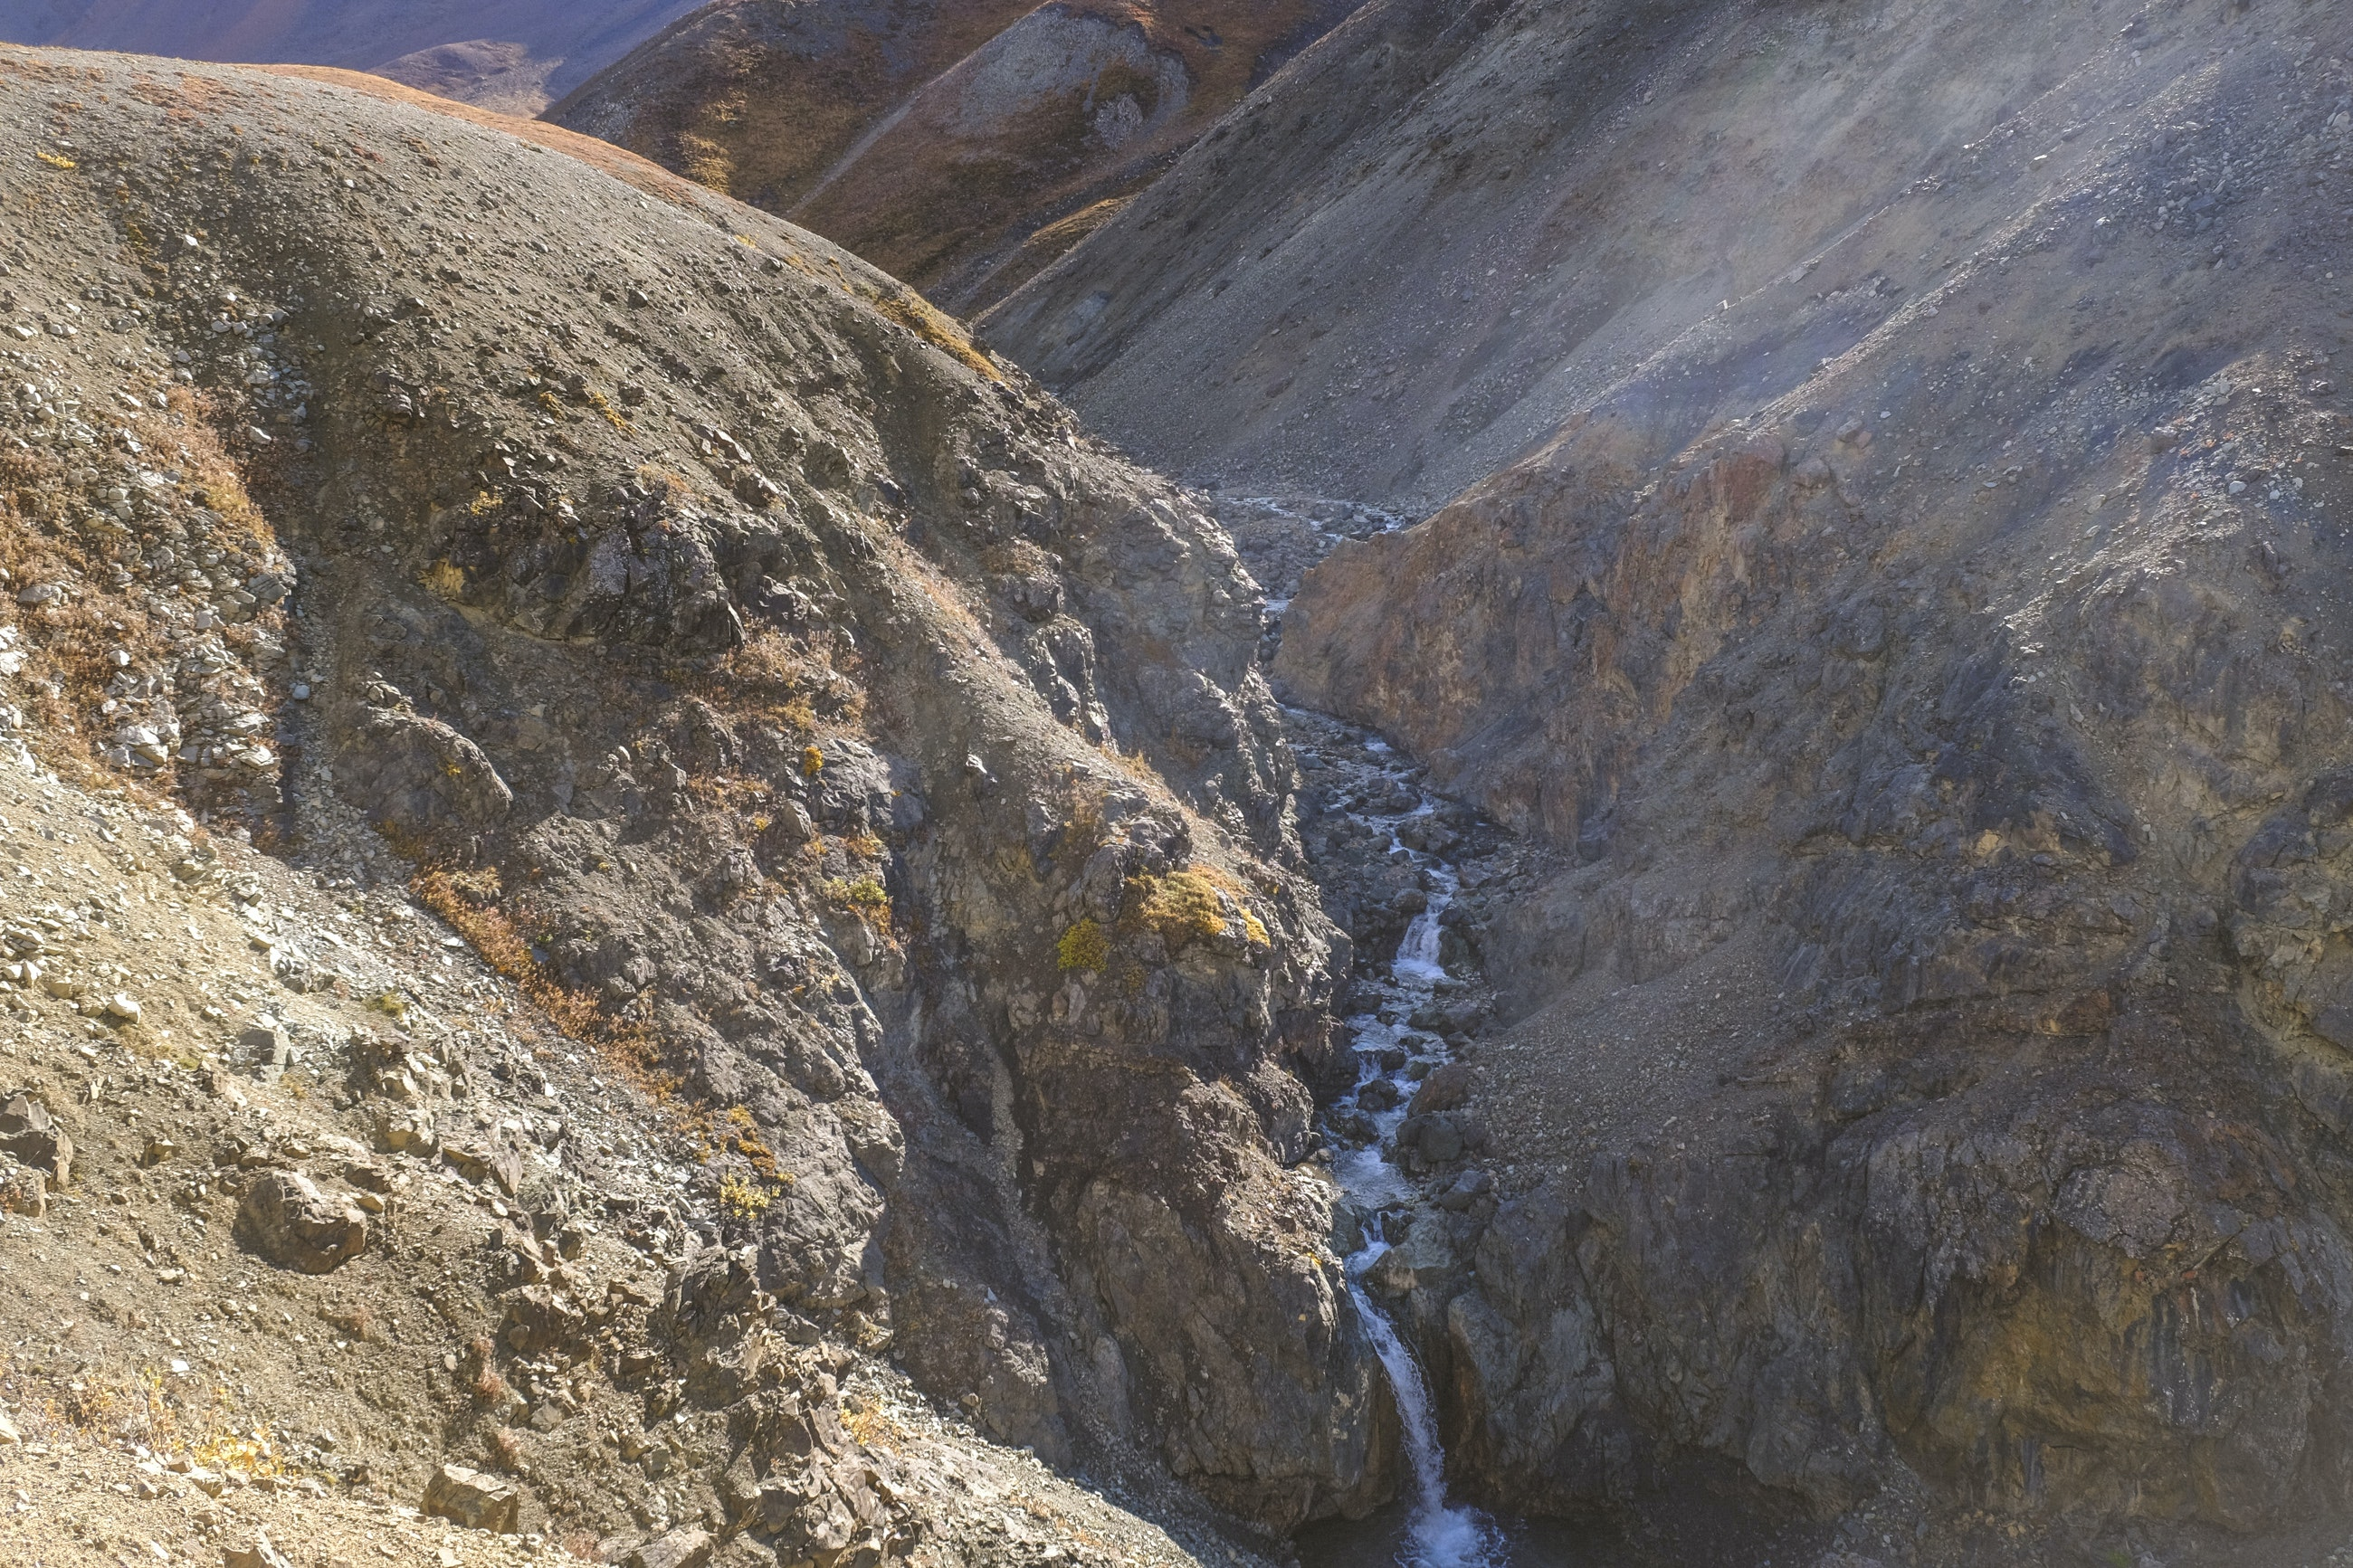 The waterfall - Denali National Park